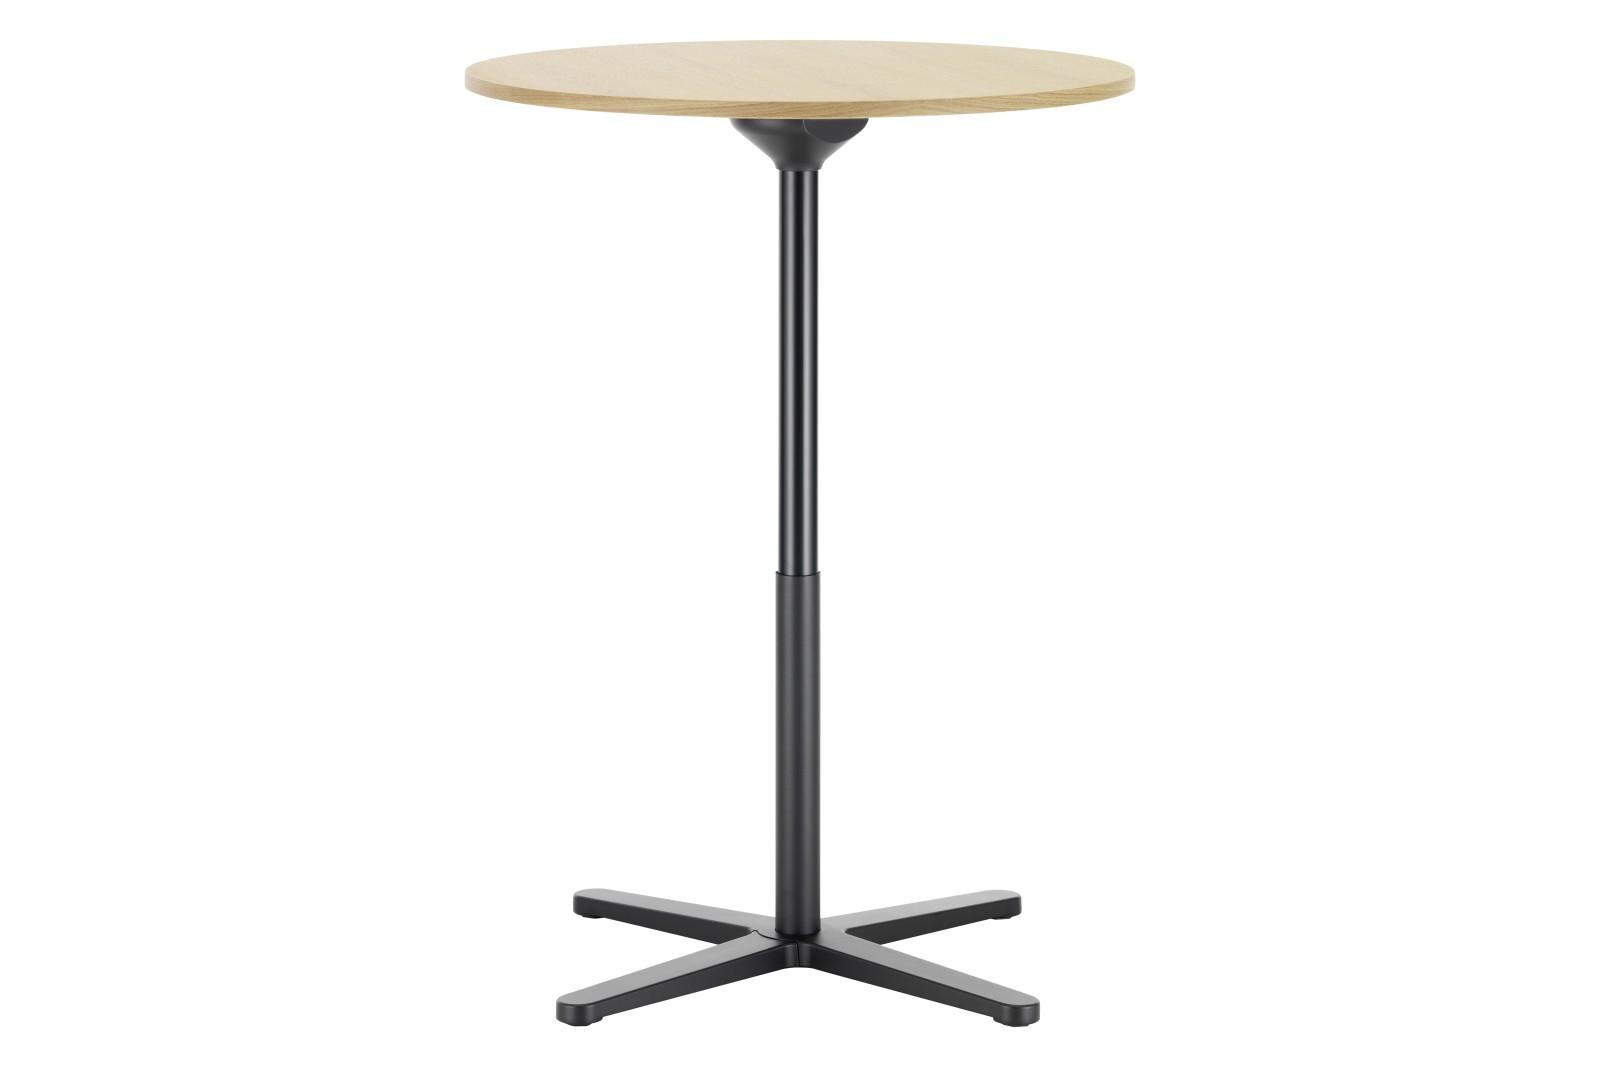 Super Fold Round Stand-up Table Light oak veneer